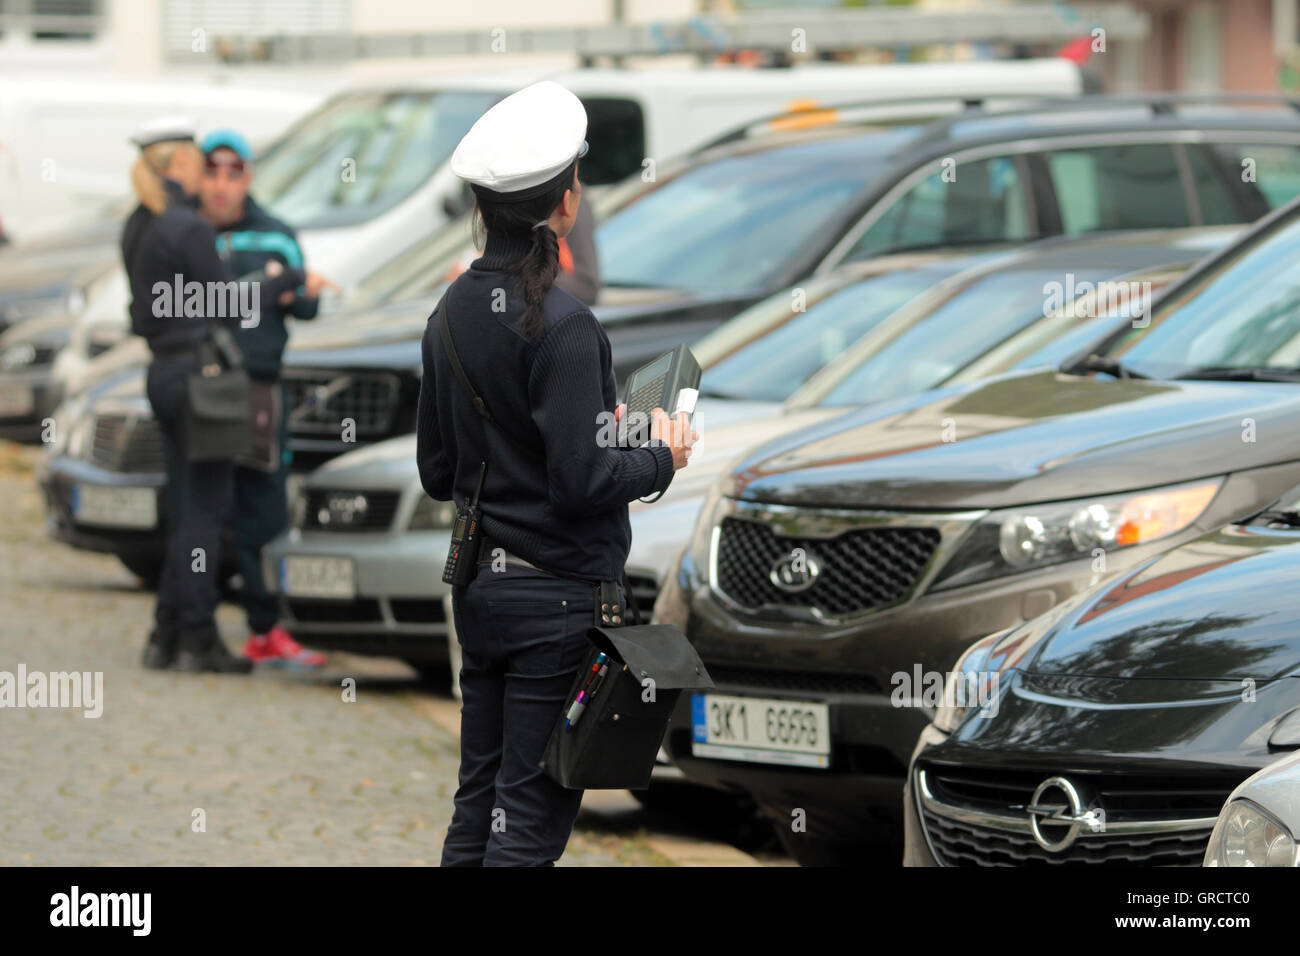 Meter Maids Issuing Tickets For Parking Violation Near Oktoberfest In Munich - Stock Image